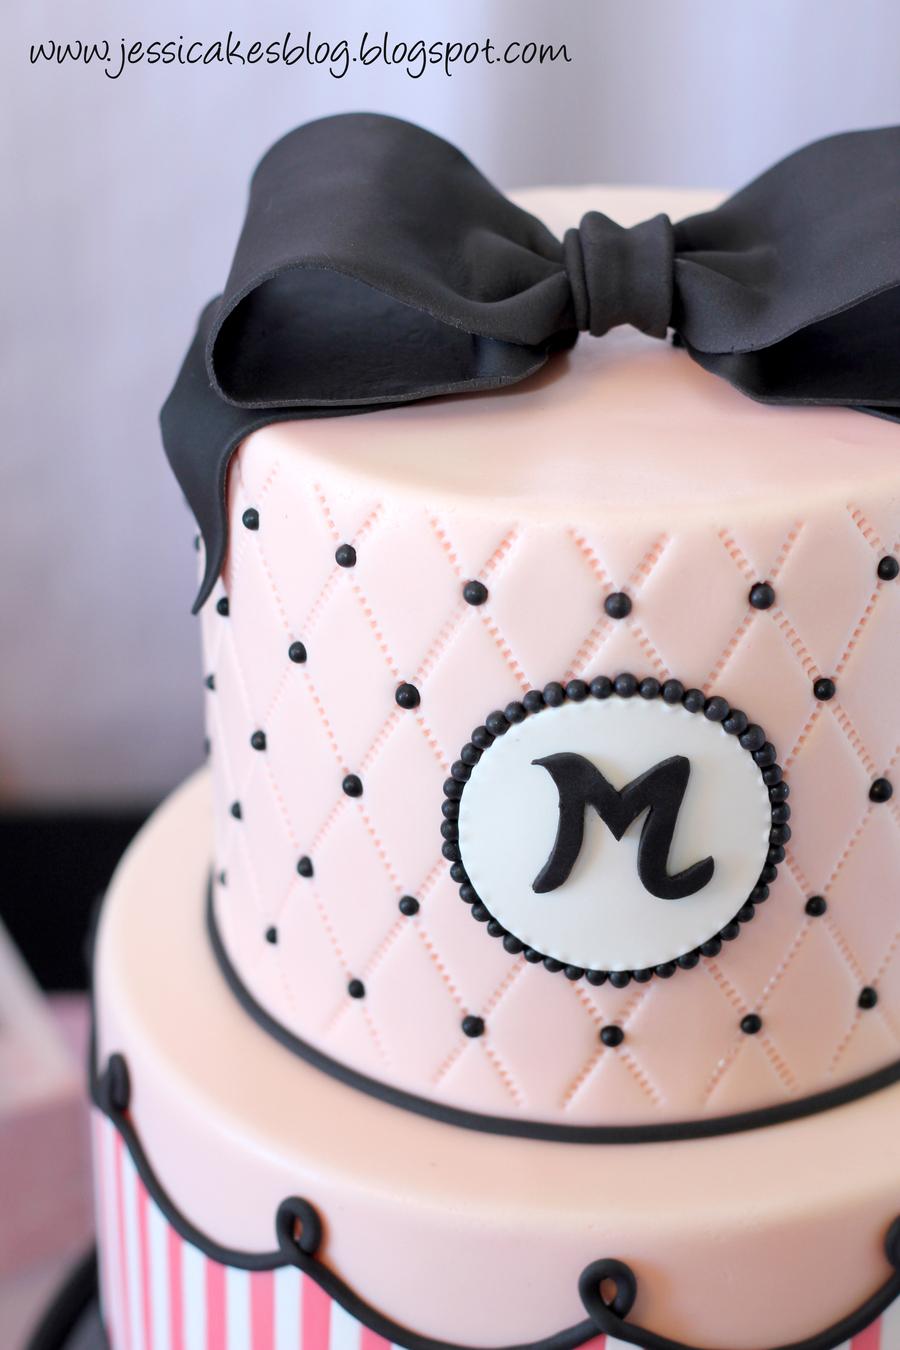 Fashionista Birthday Cake - CakeCentral.com